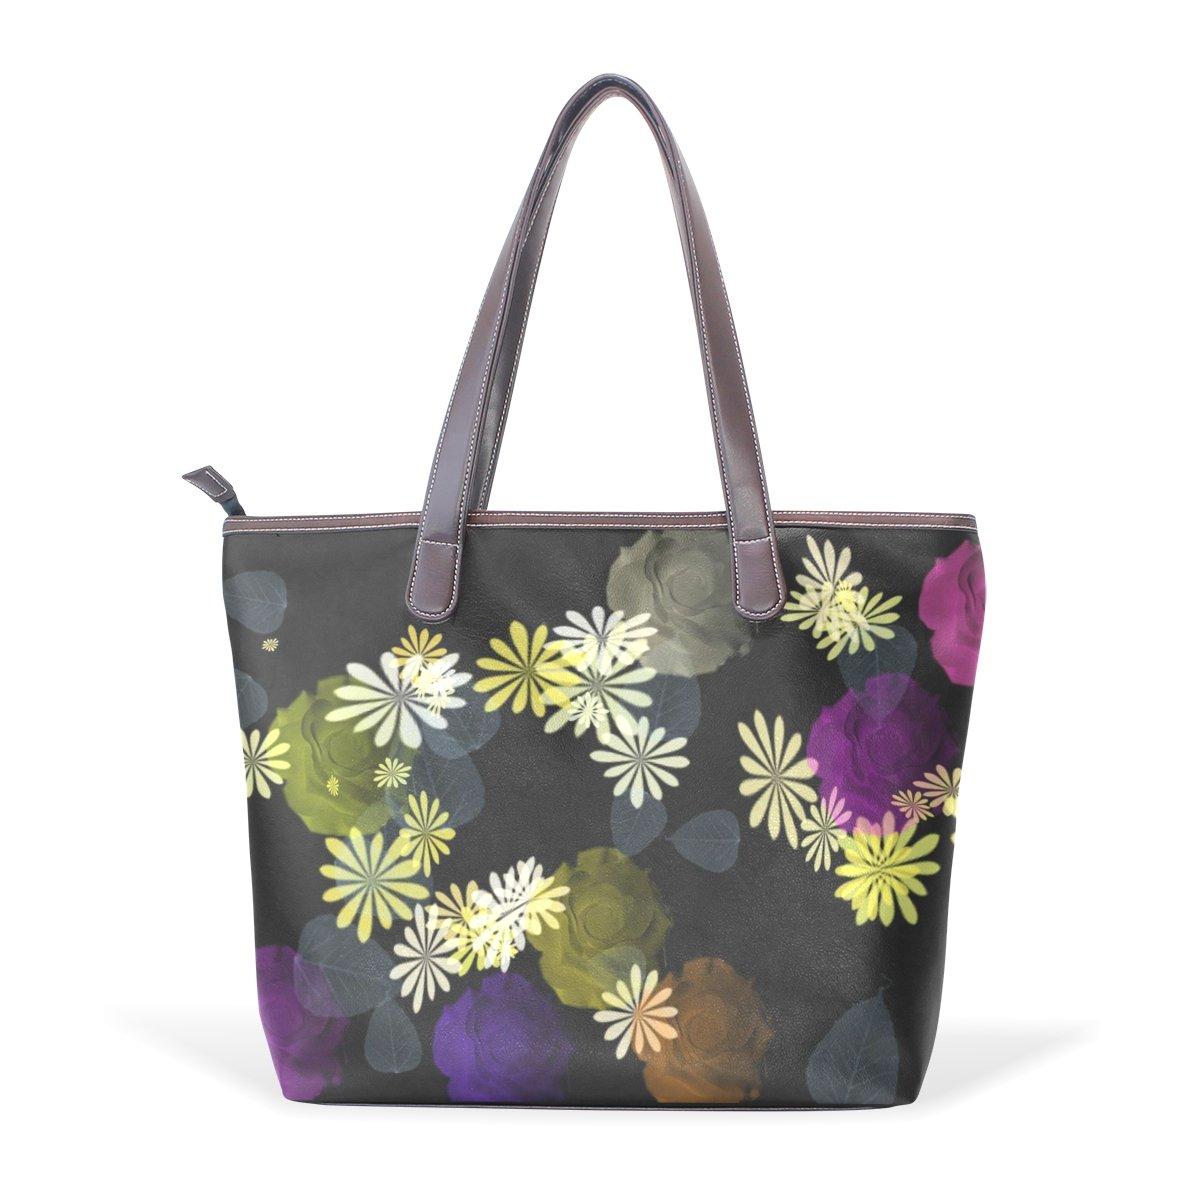 Ye Store Daisy Lady PU Leather Handbag Tote Bag Shoulder Bag Shopping Bag